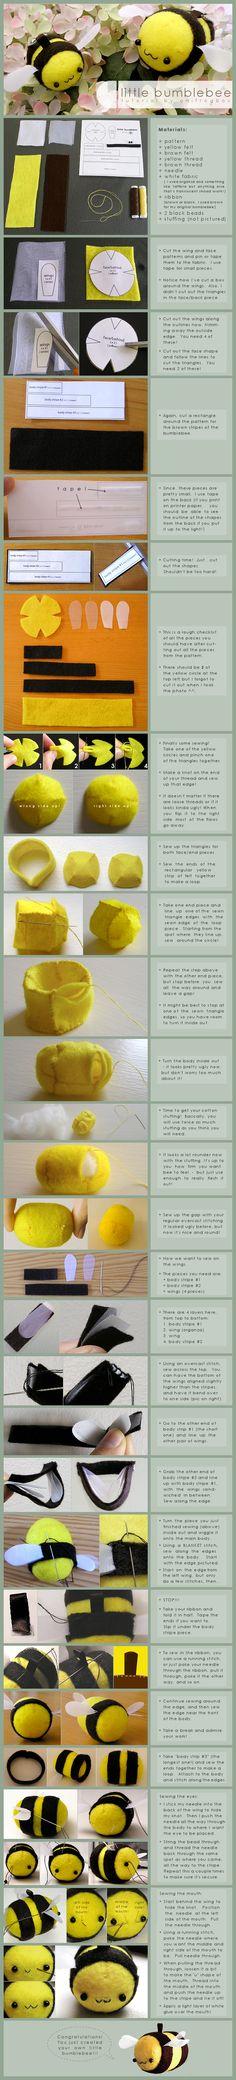 little bumblebee: tutorial by ~onifrogbox on deviantART